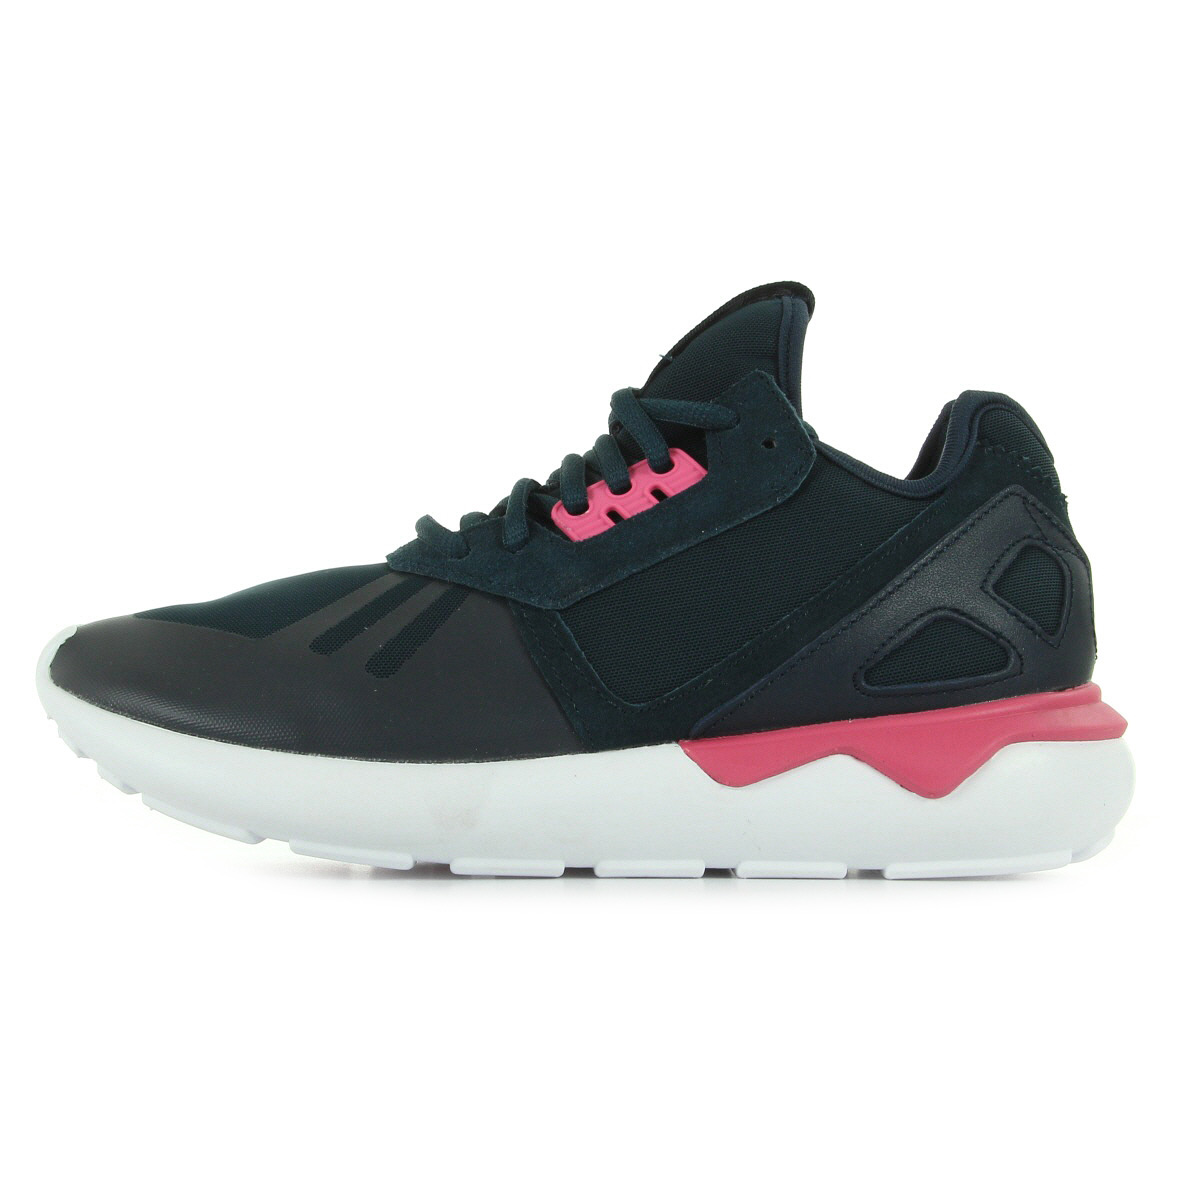 Adidas Tubular Fille